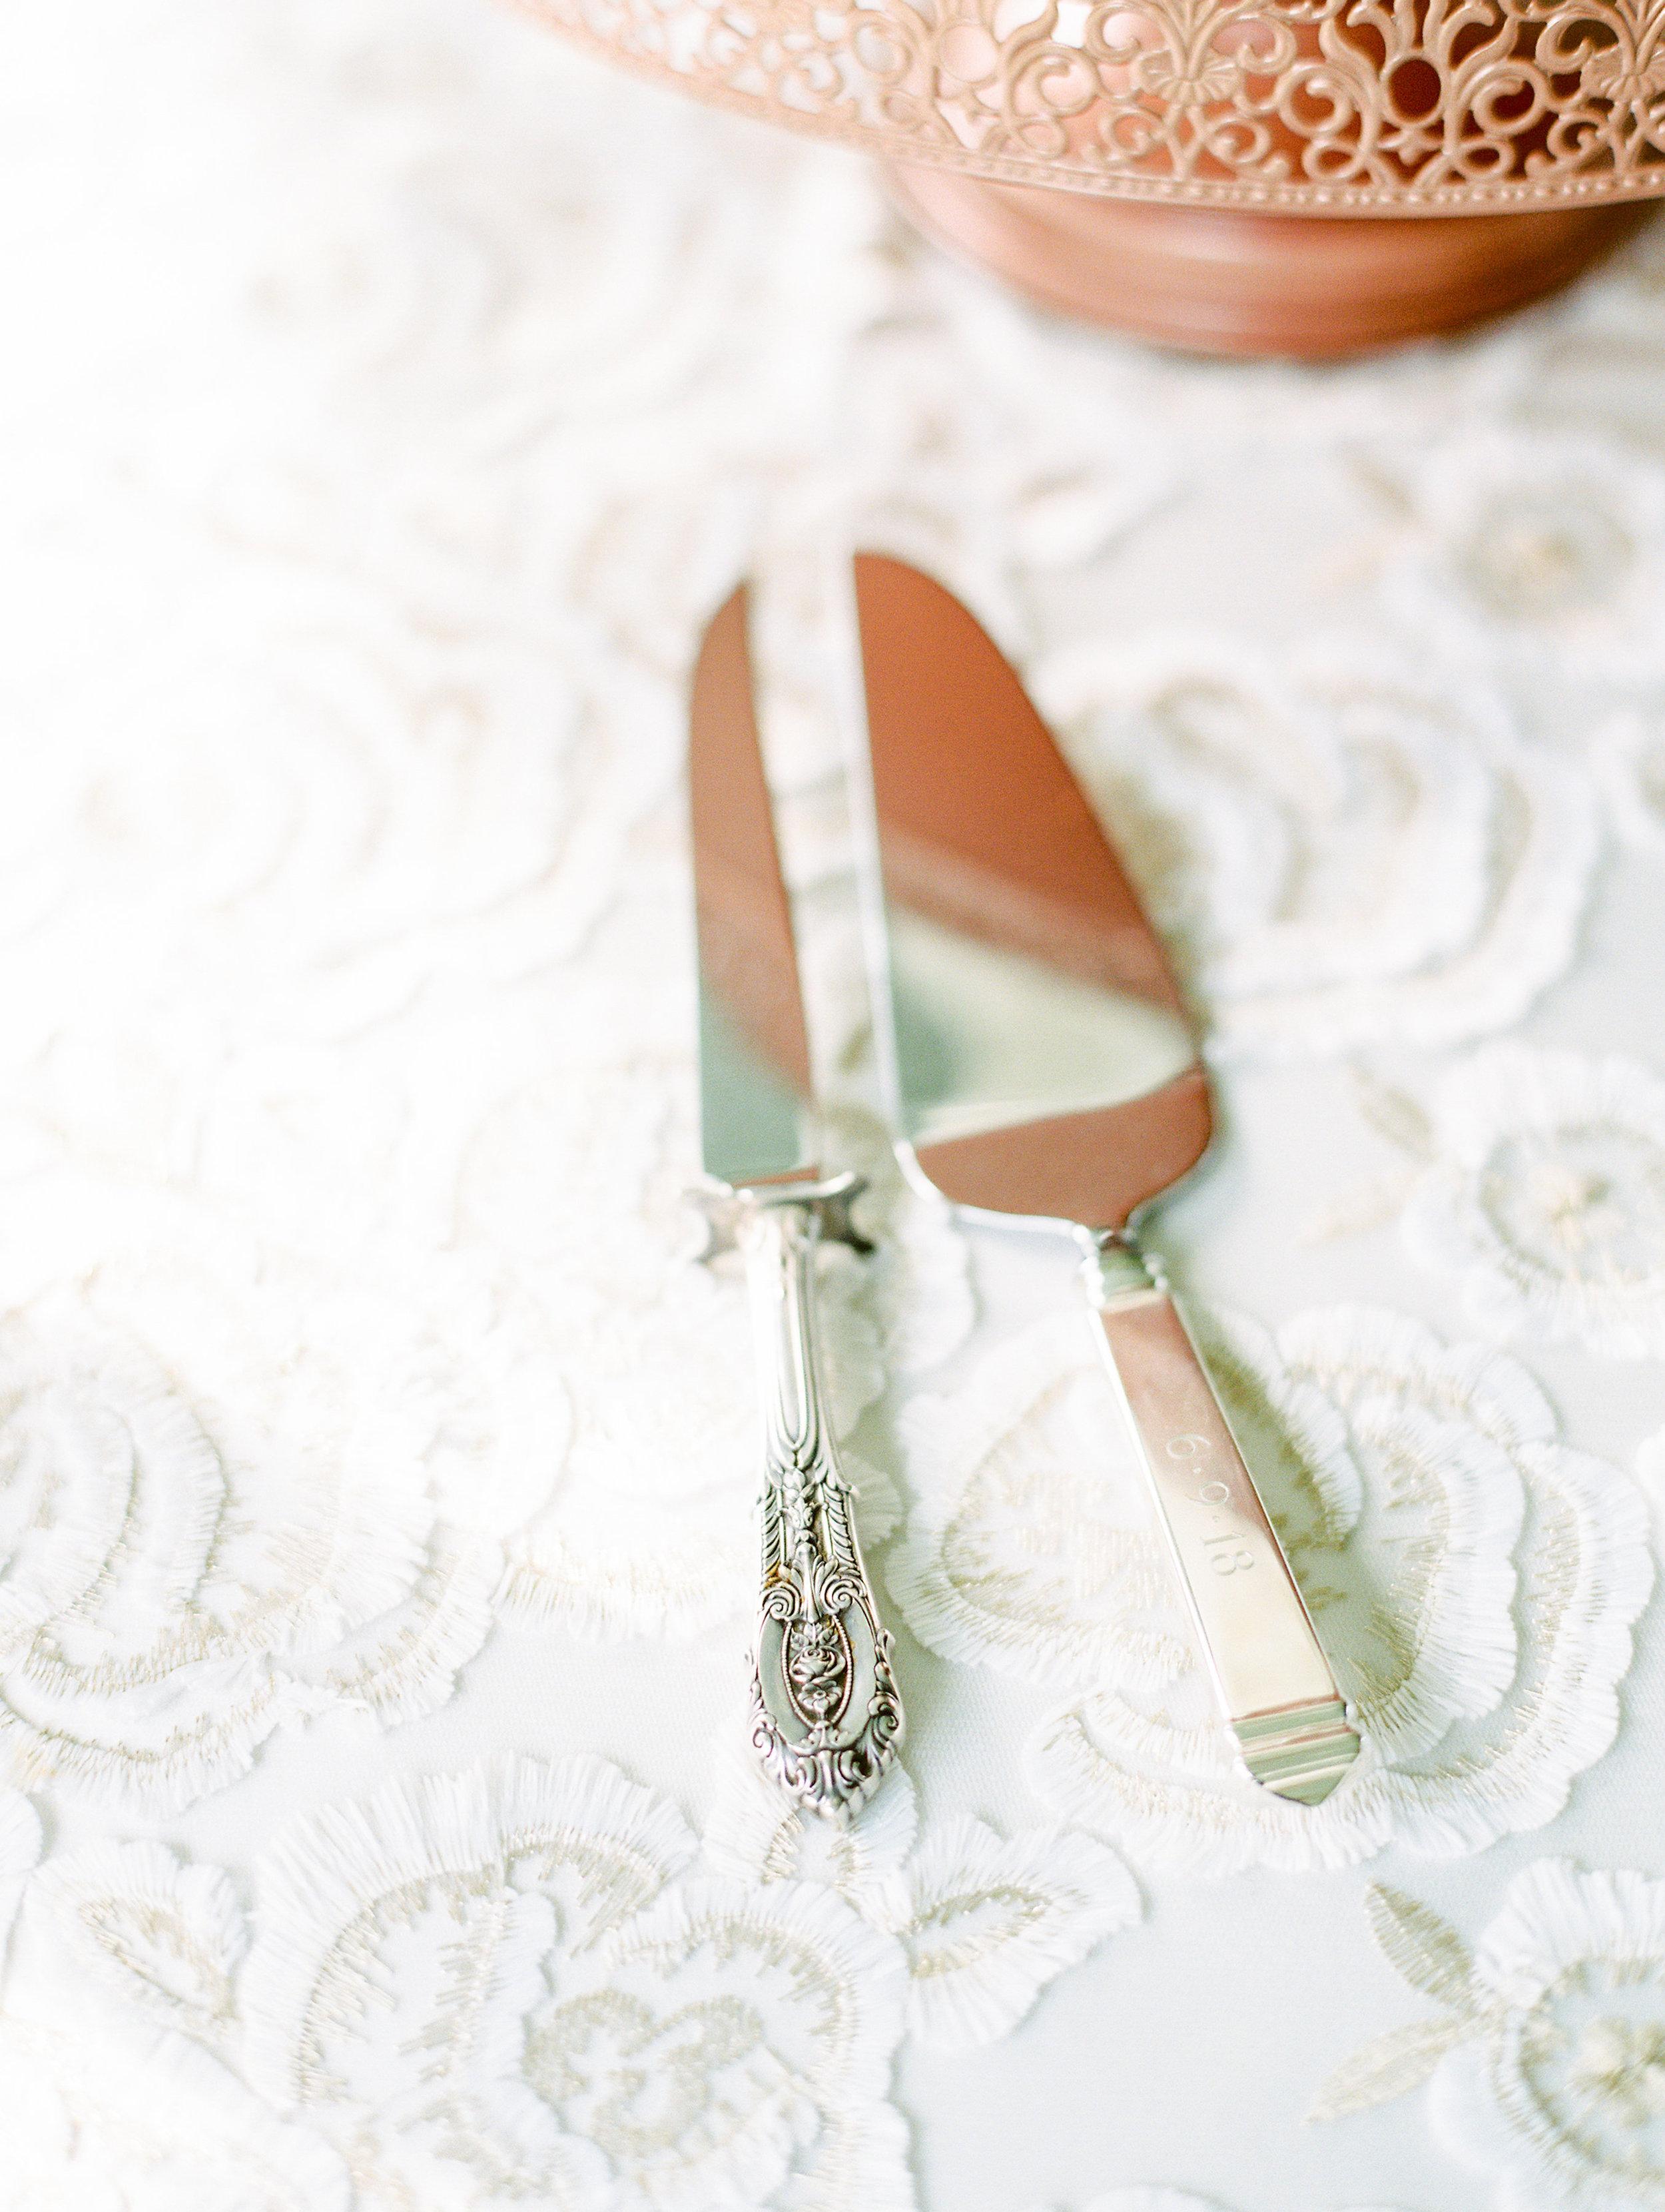 Coffman+Wedding+Reception+Details-91.jpg